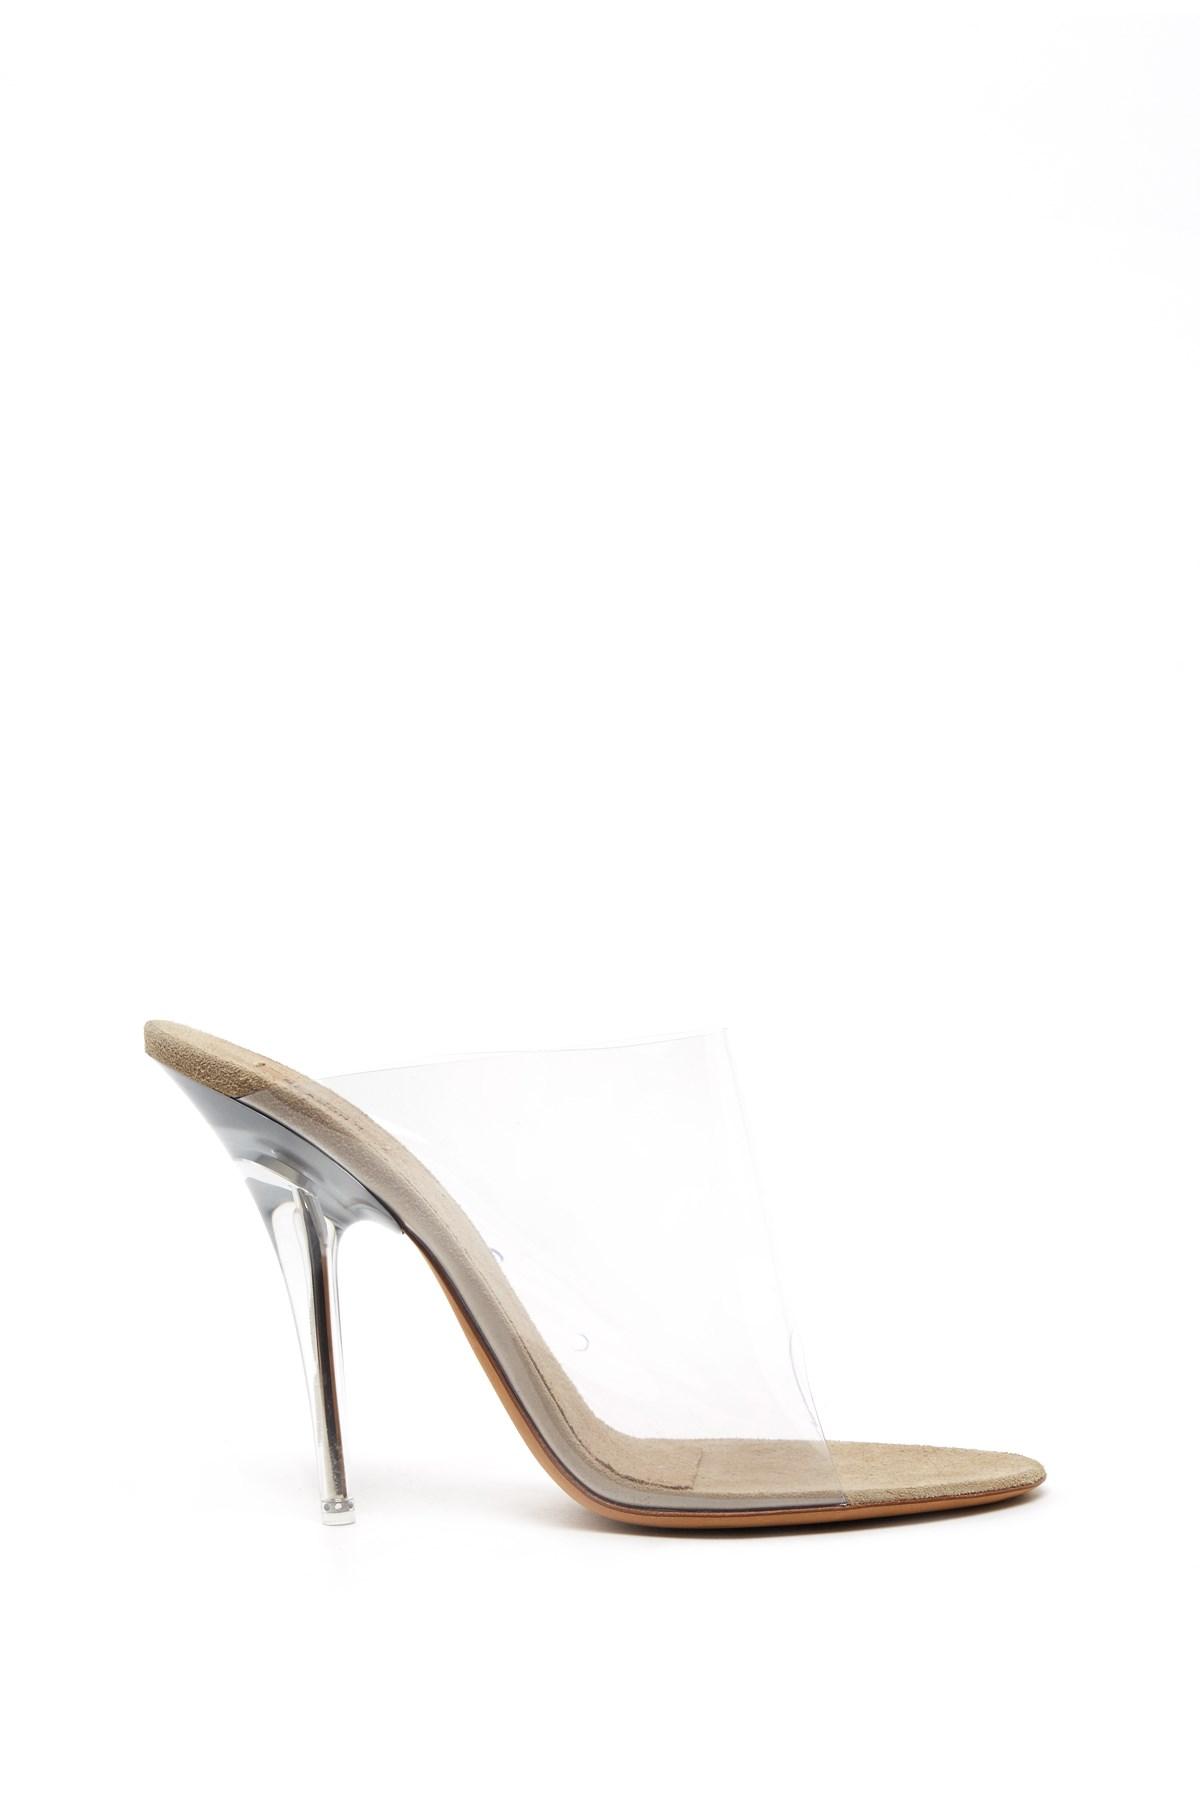 8b7e5d9943 yeezy pvc mules available on julian-fashion.com - 45570